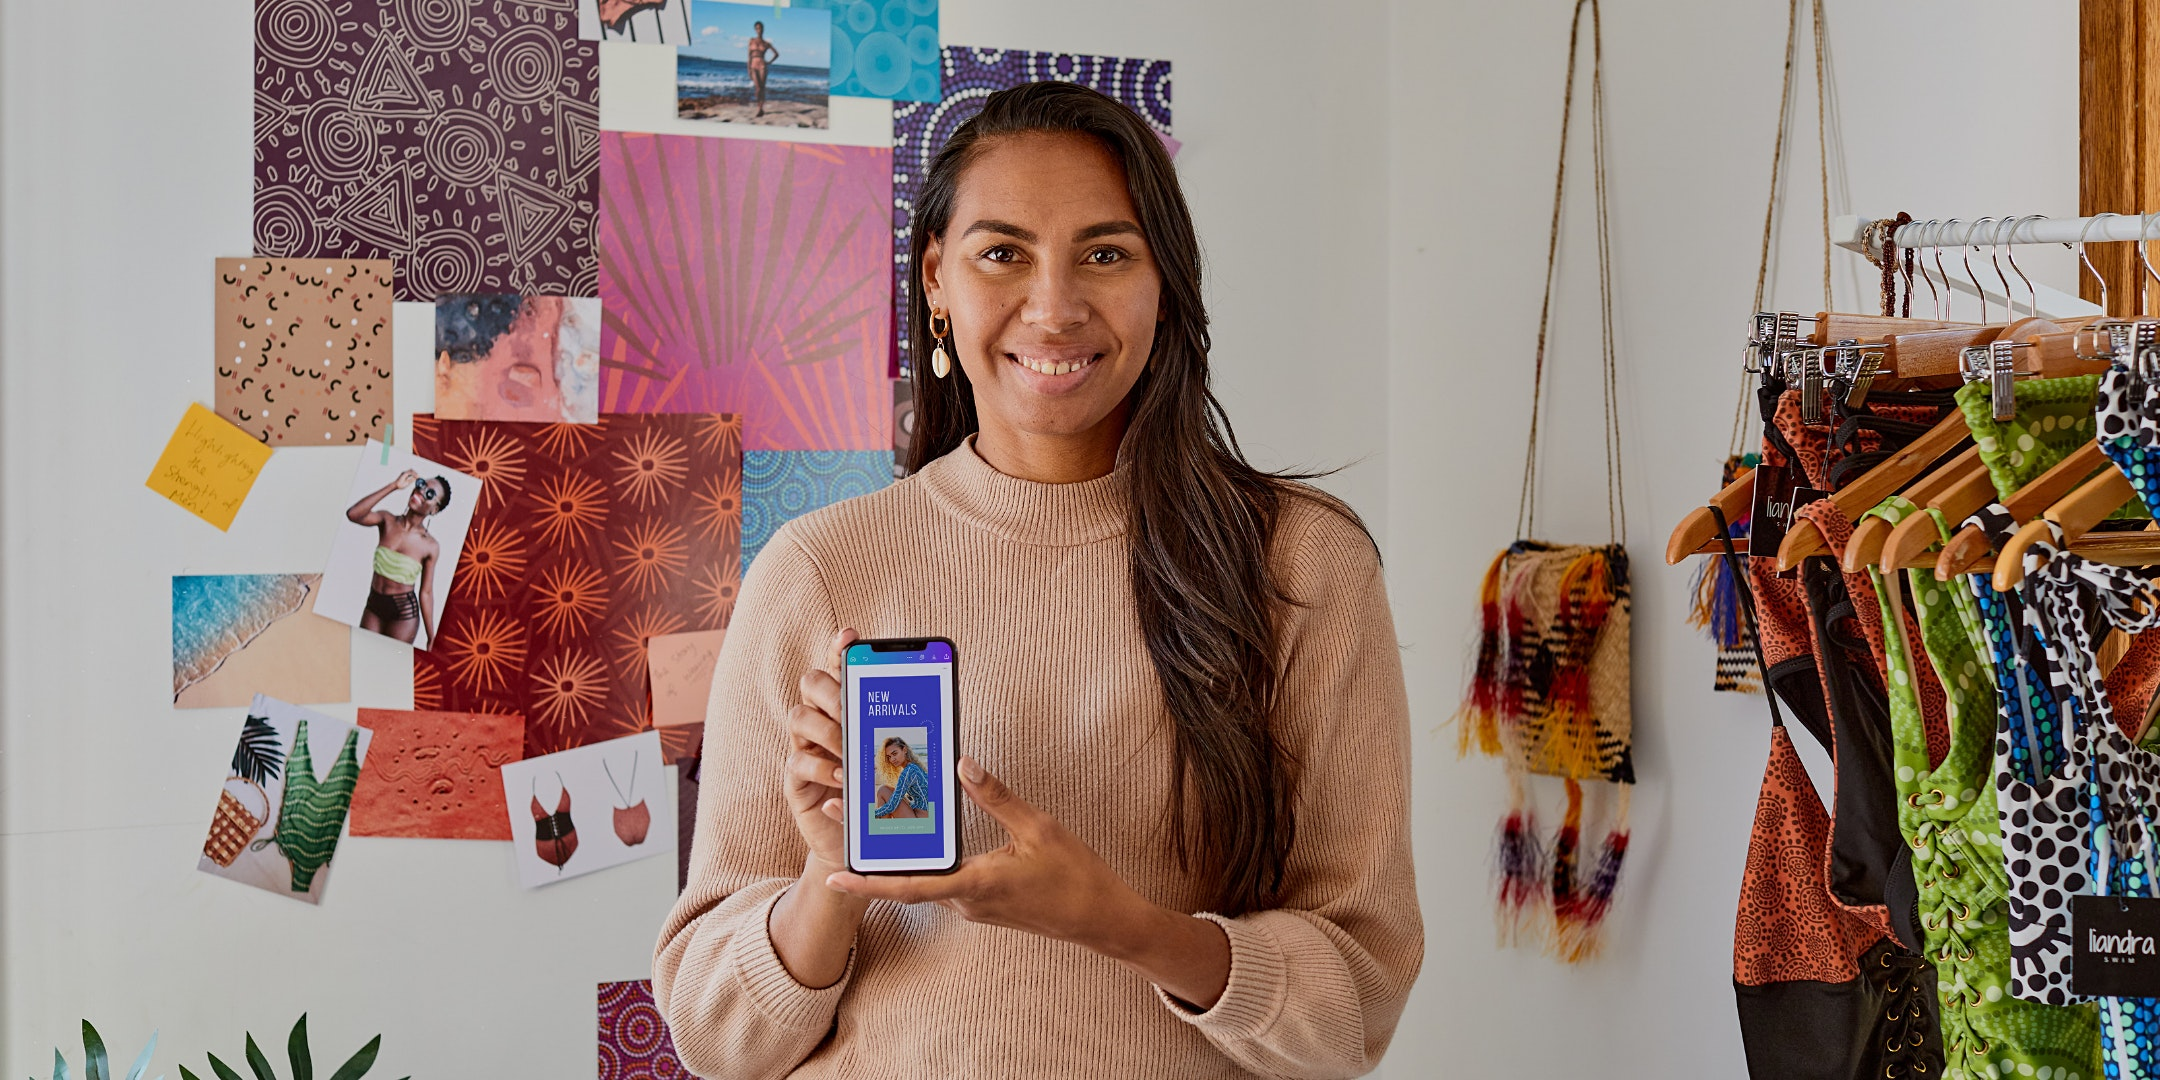 Pocket Presentations: Canva for Mobile and Tablet